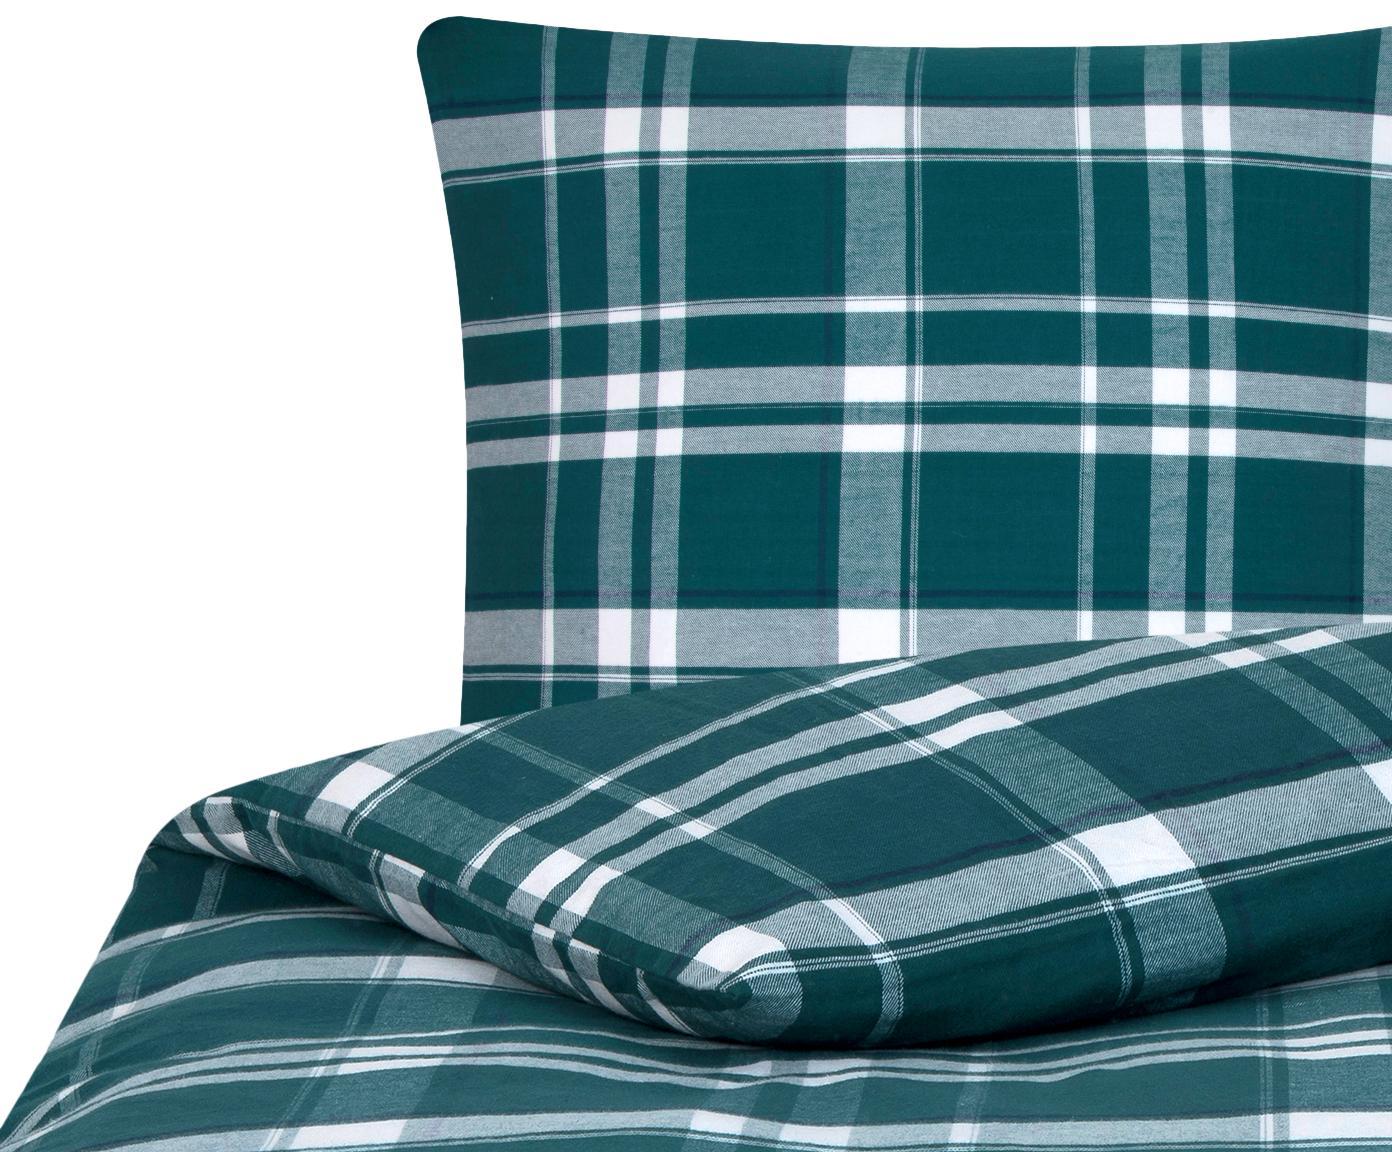 Flanell-Bettwäsche Rolf, kariert, Webart: Flanell Flanell ist ein s, Grün, 135 x 200 cm